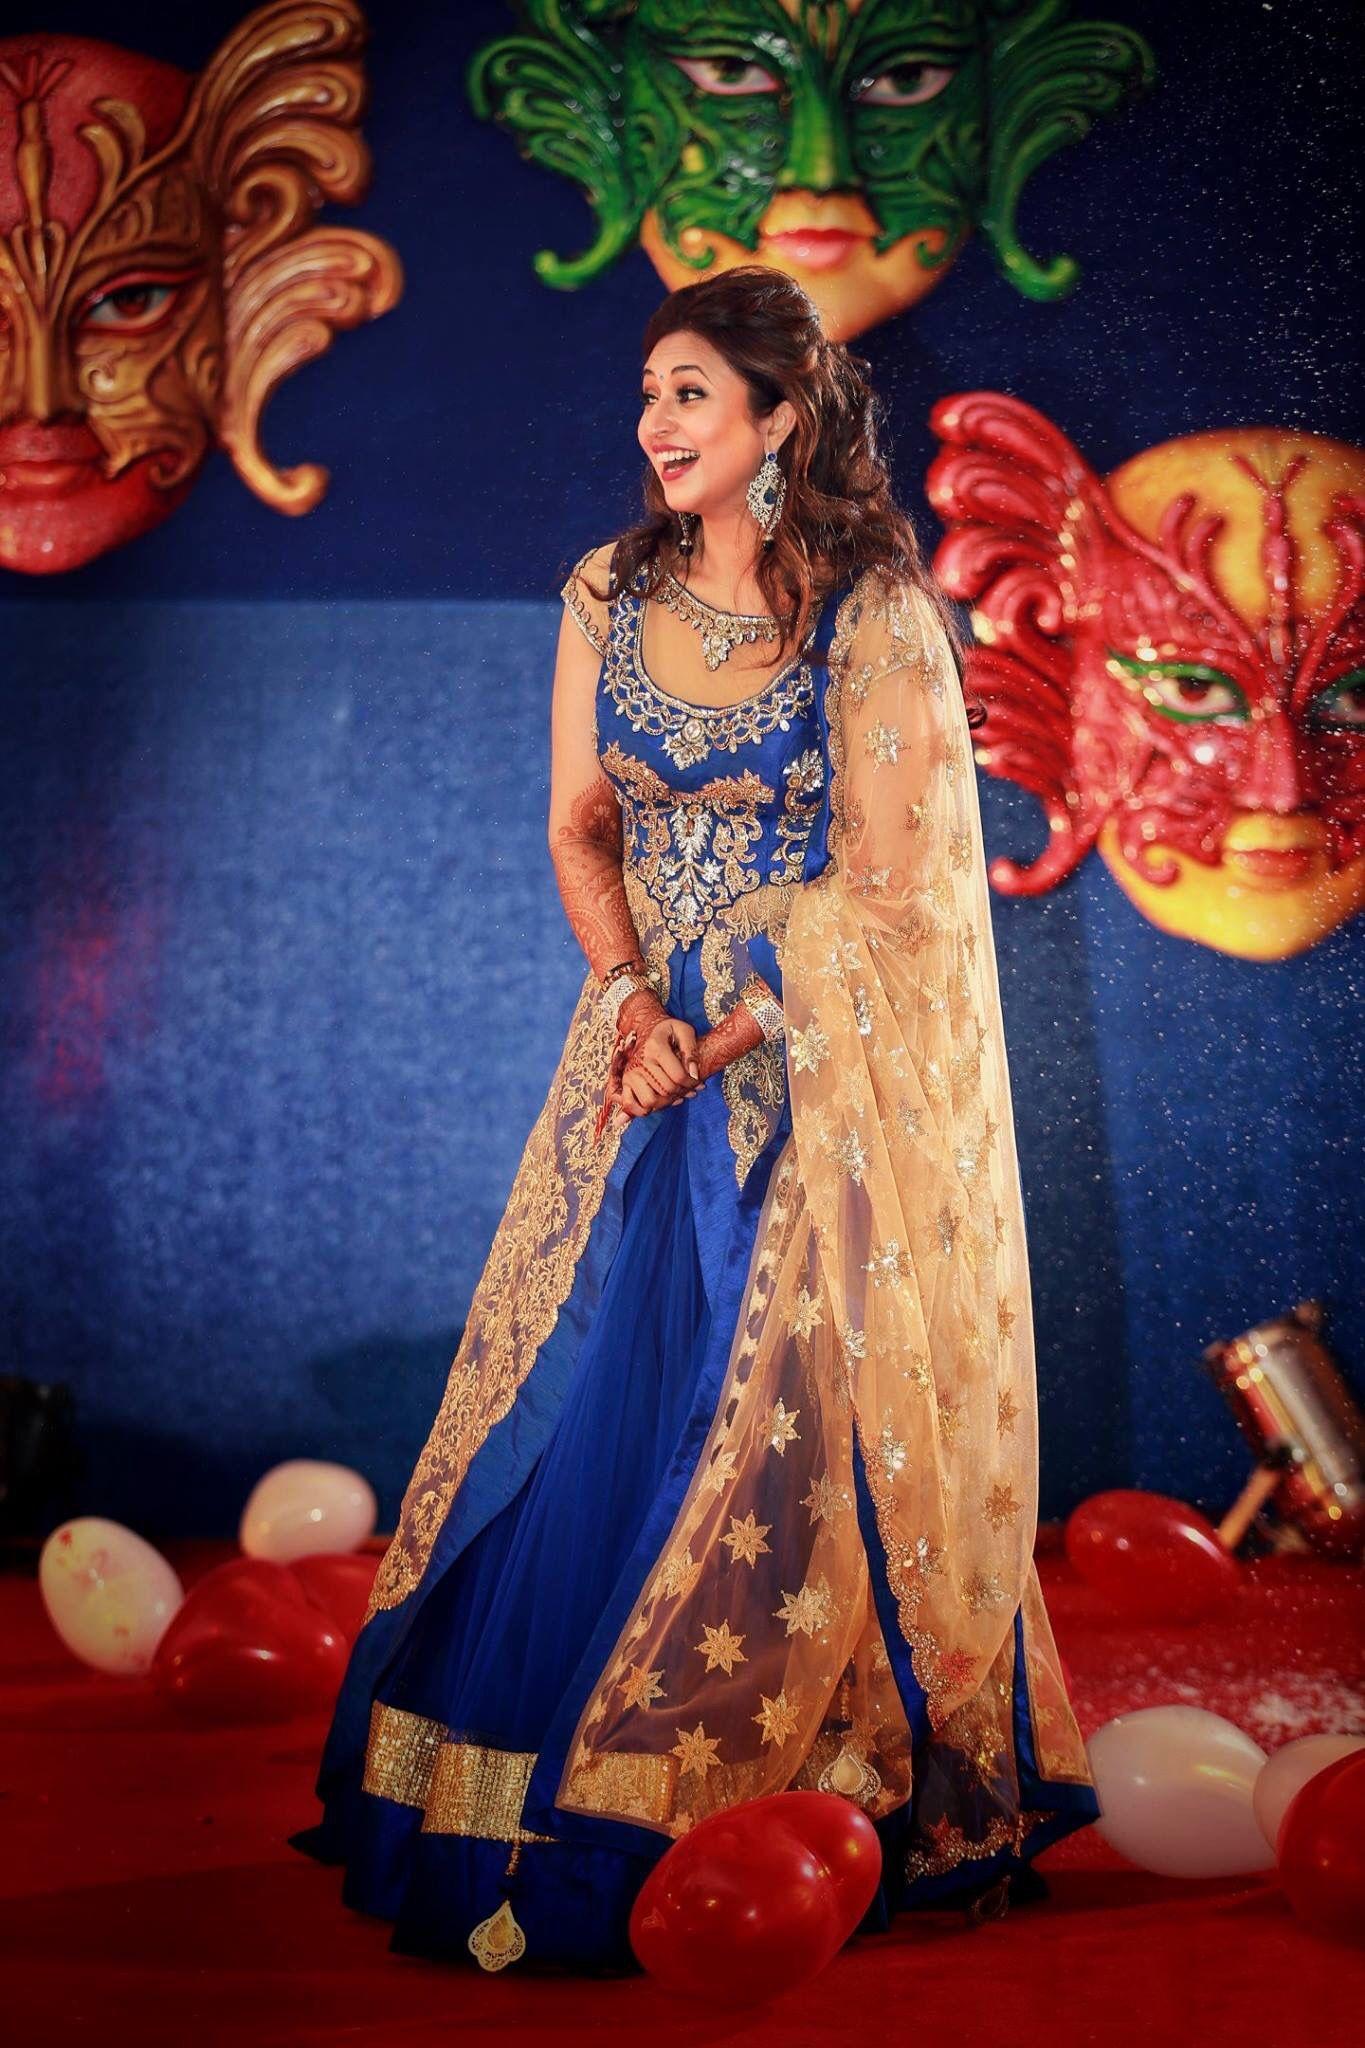 Shweta Tiwari To Divyanka Tripathi's Perfect Guide To Making The Best Guest Appearance At A Wedding - A9Themes News :: TV Serial :: Divyanka Tripathi, Guest Appearance, Shweta Tiwari, Wedding Fashion by A9Themes Media on A9Themes News